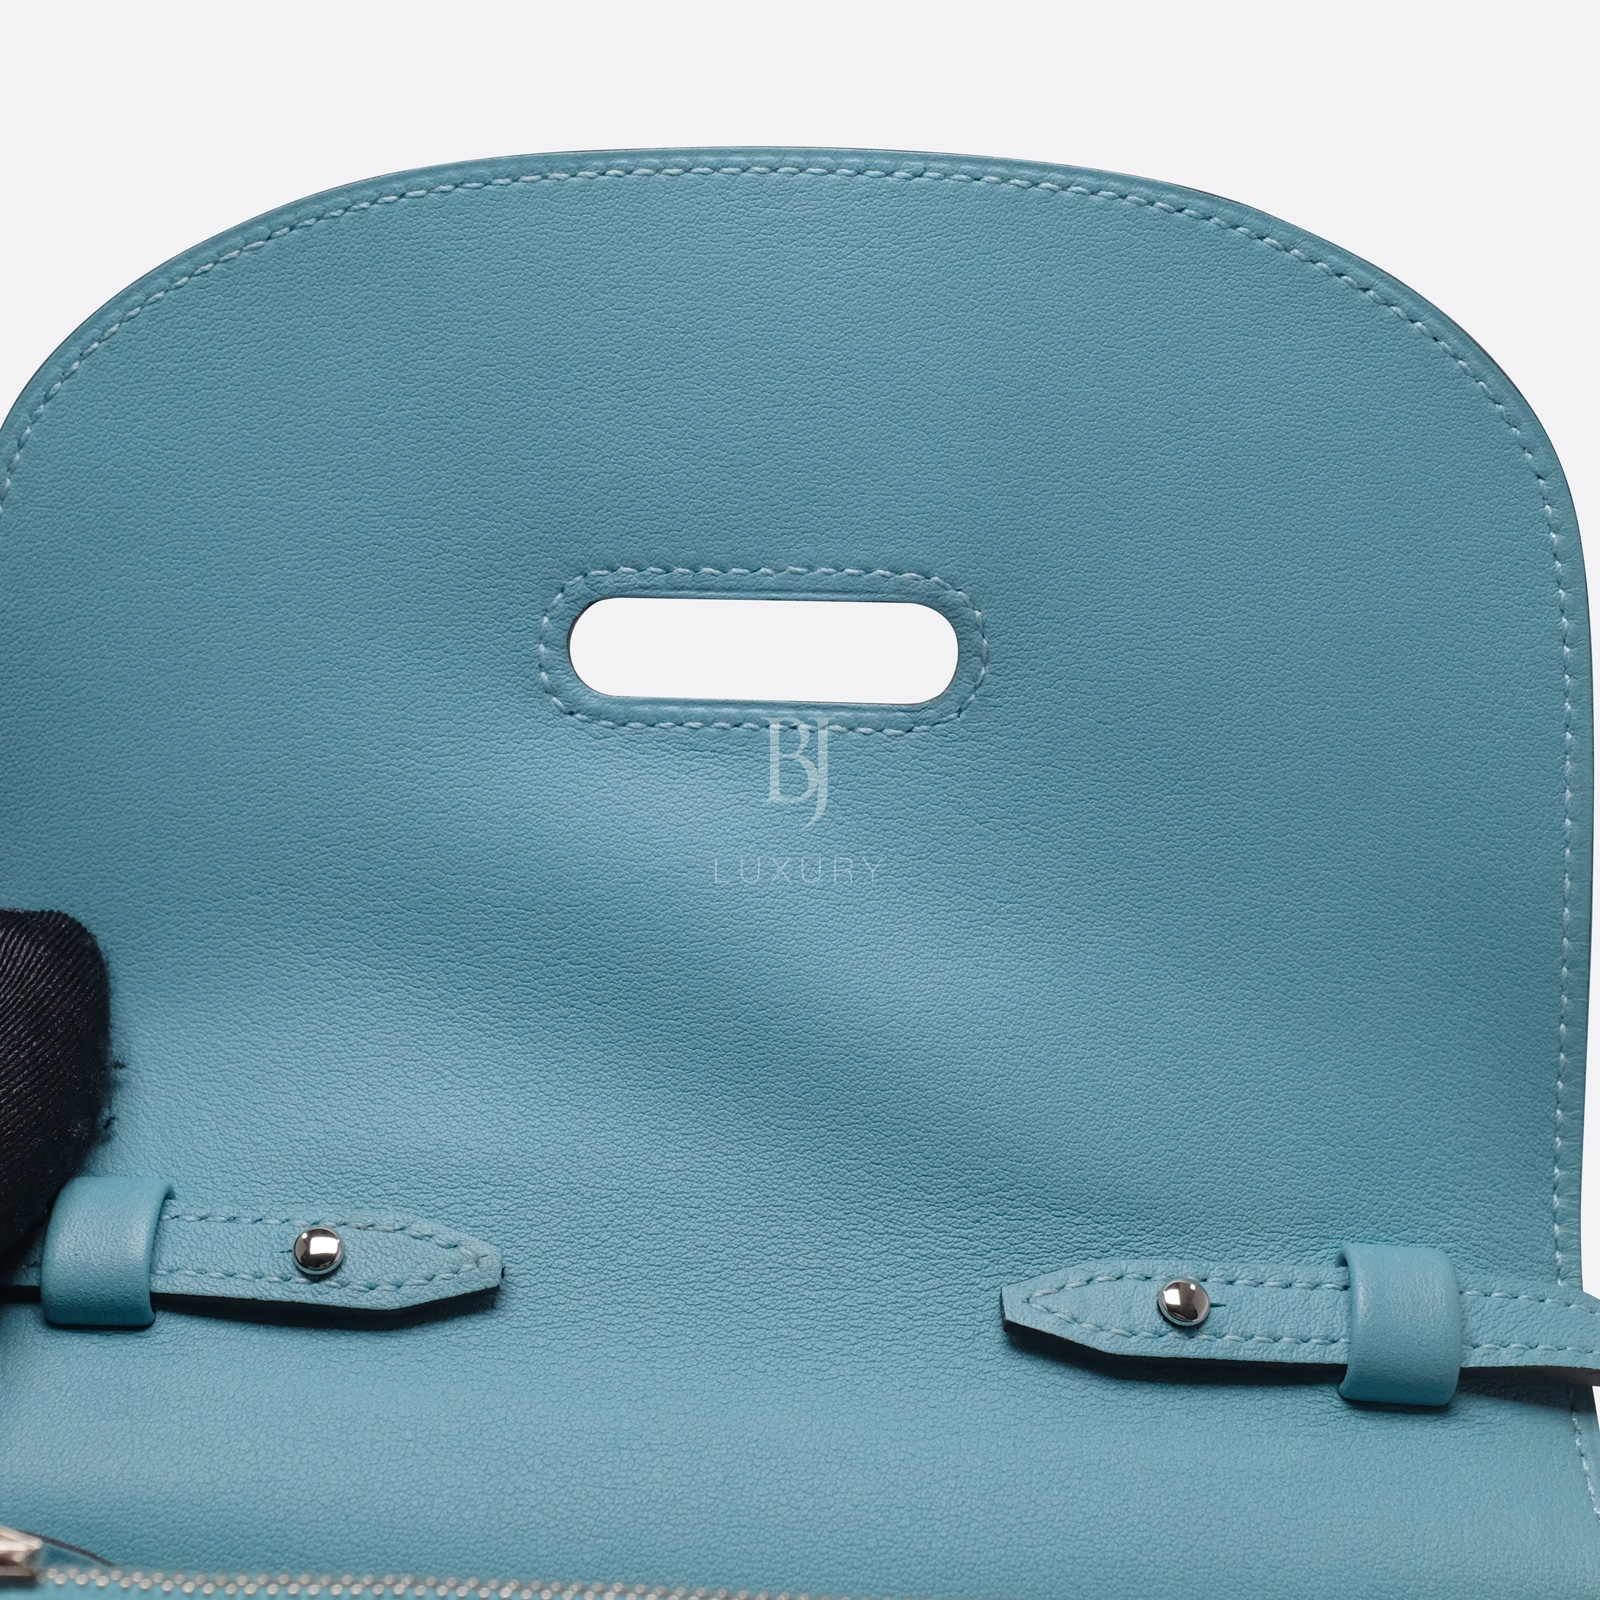 Hermes Conveyor Bag 16 Turquoise Swift Lizard Palladium BJ Luxury 12.jpg